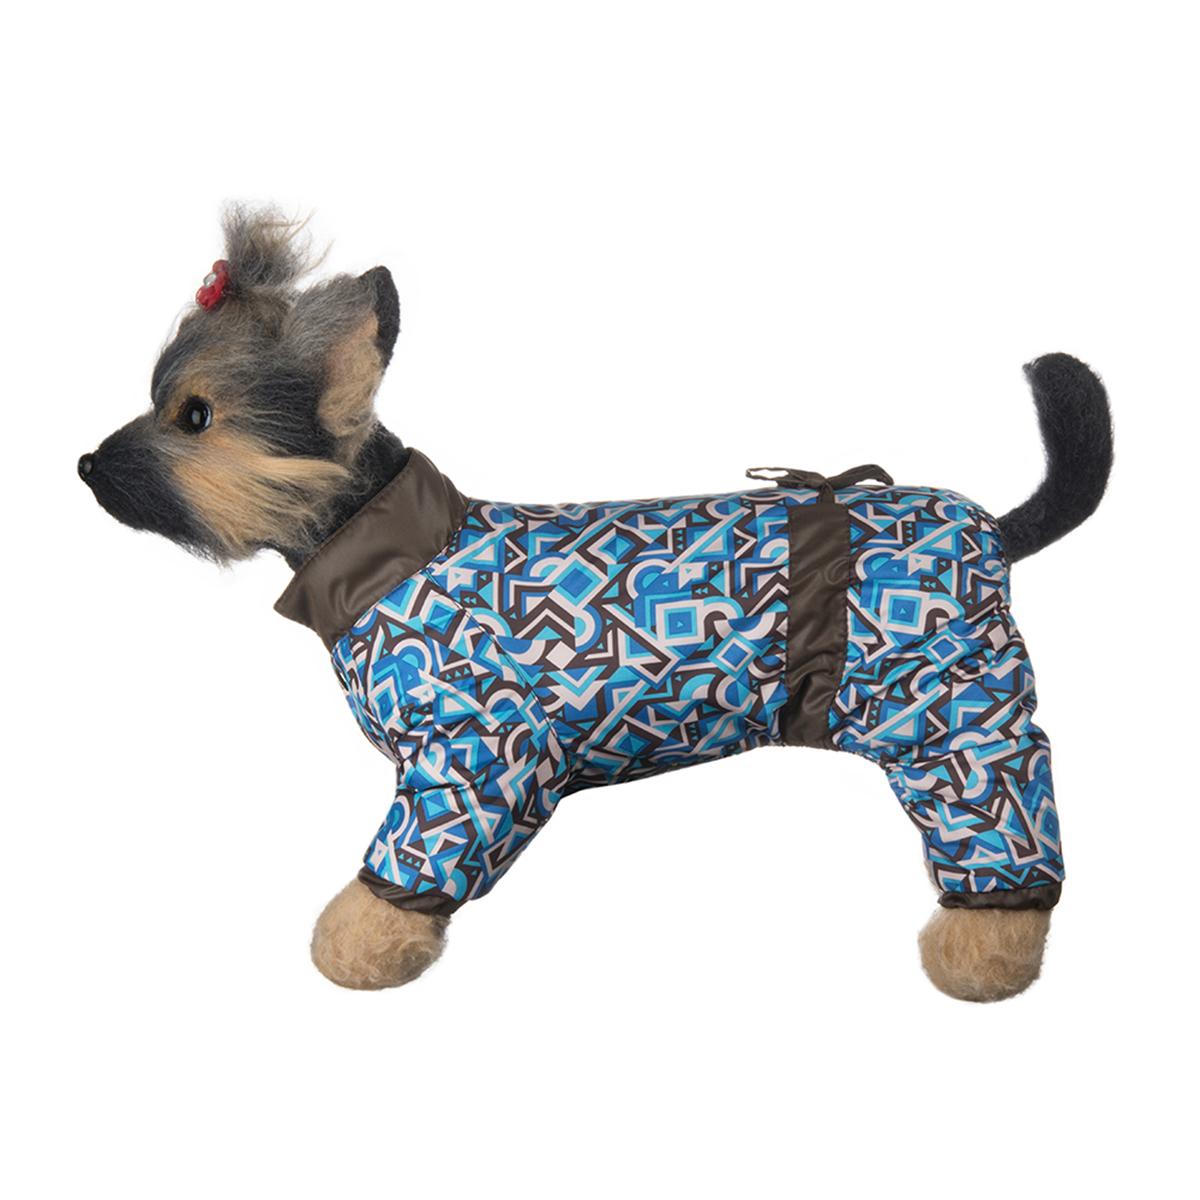 "Комбинезон для собак Dogmoda ""Норд"", зимний, унисекс, цвет: коричневый, бежевый, голубой. Размер 4 (XL)"